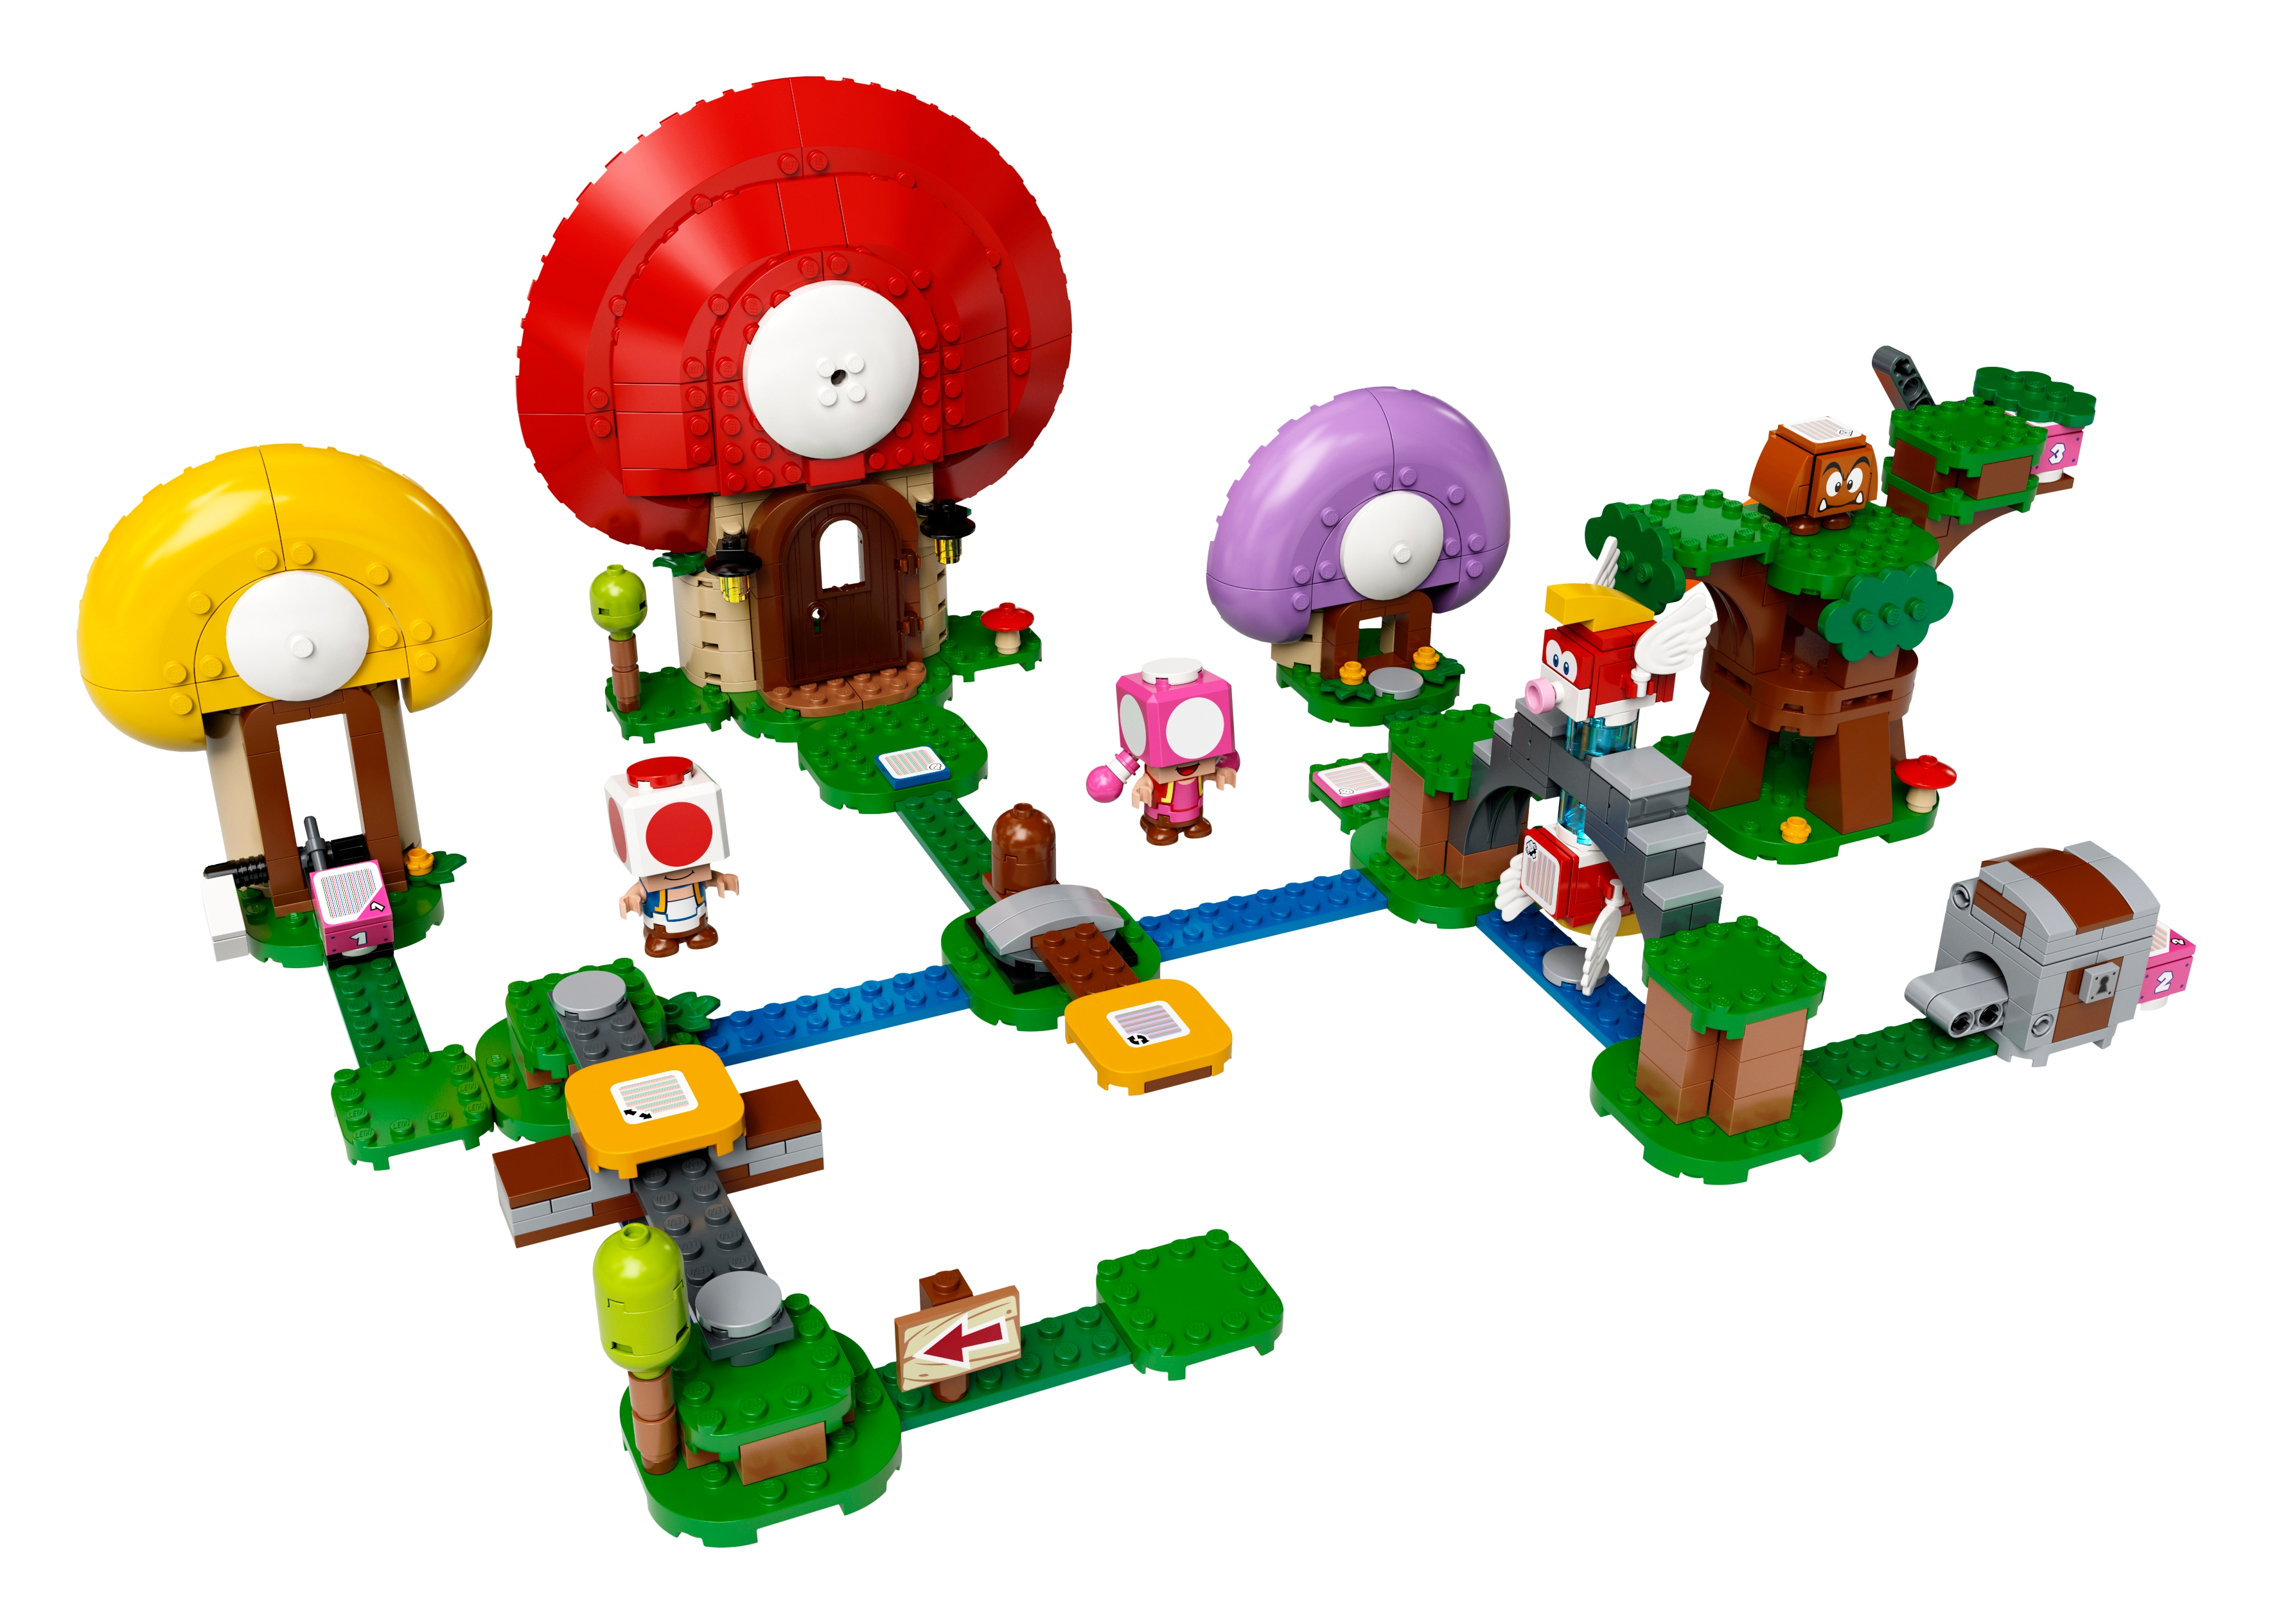 Toad's Treasure Hunt Expansion Set